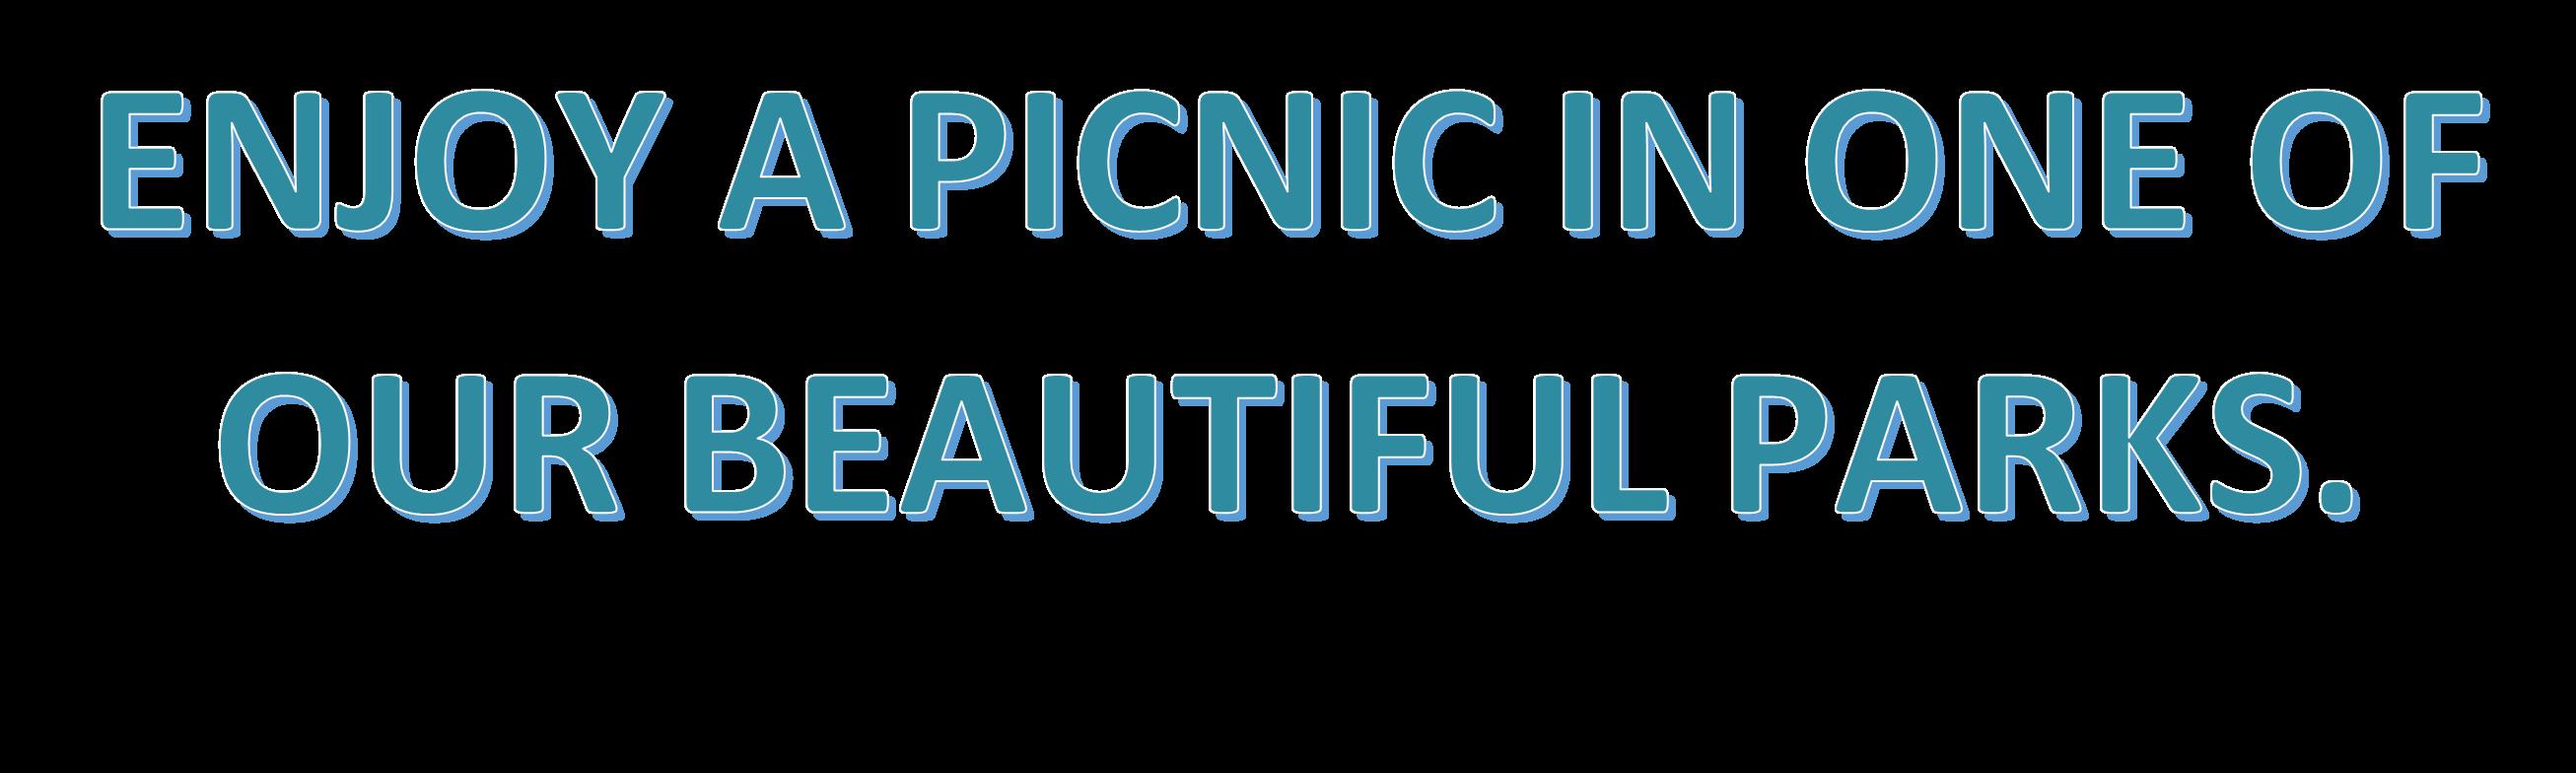 picnic text 3